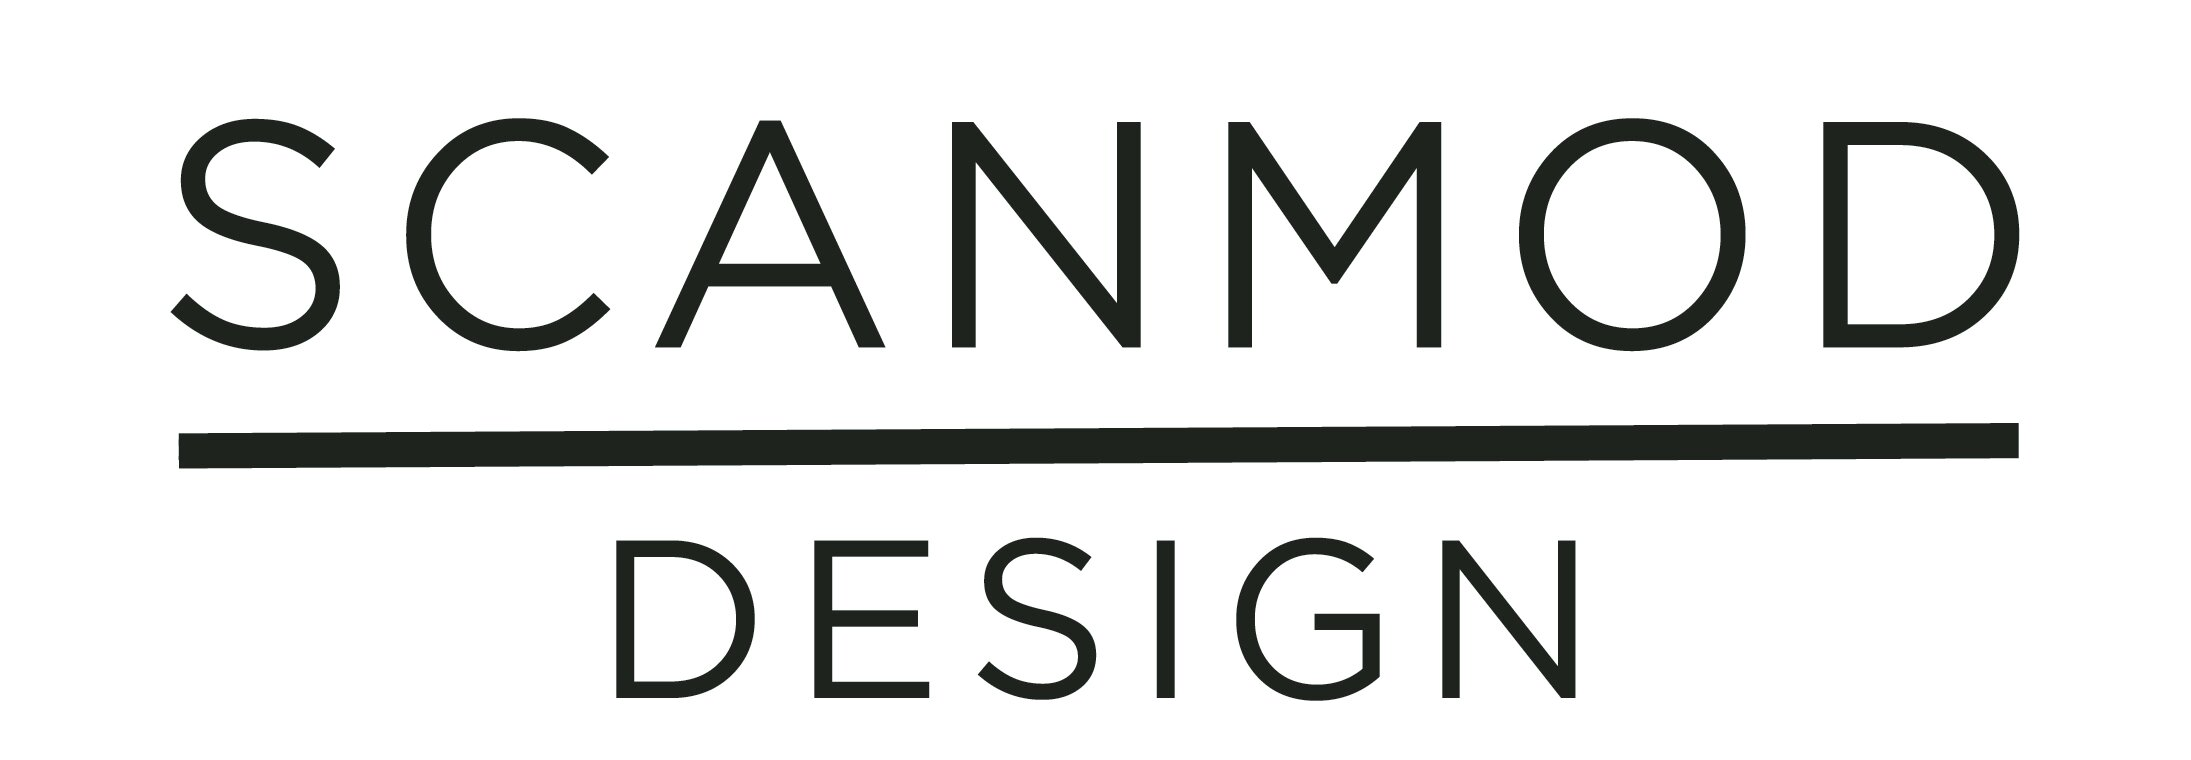 ScanMod Design |